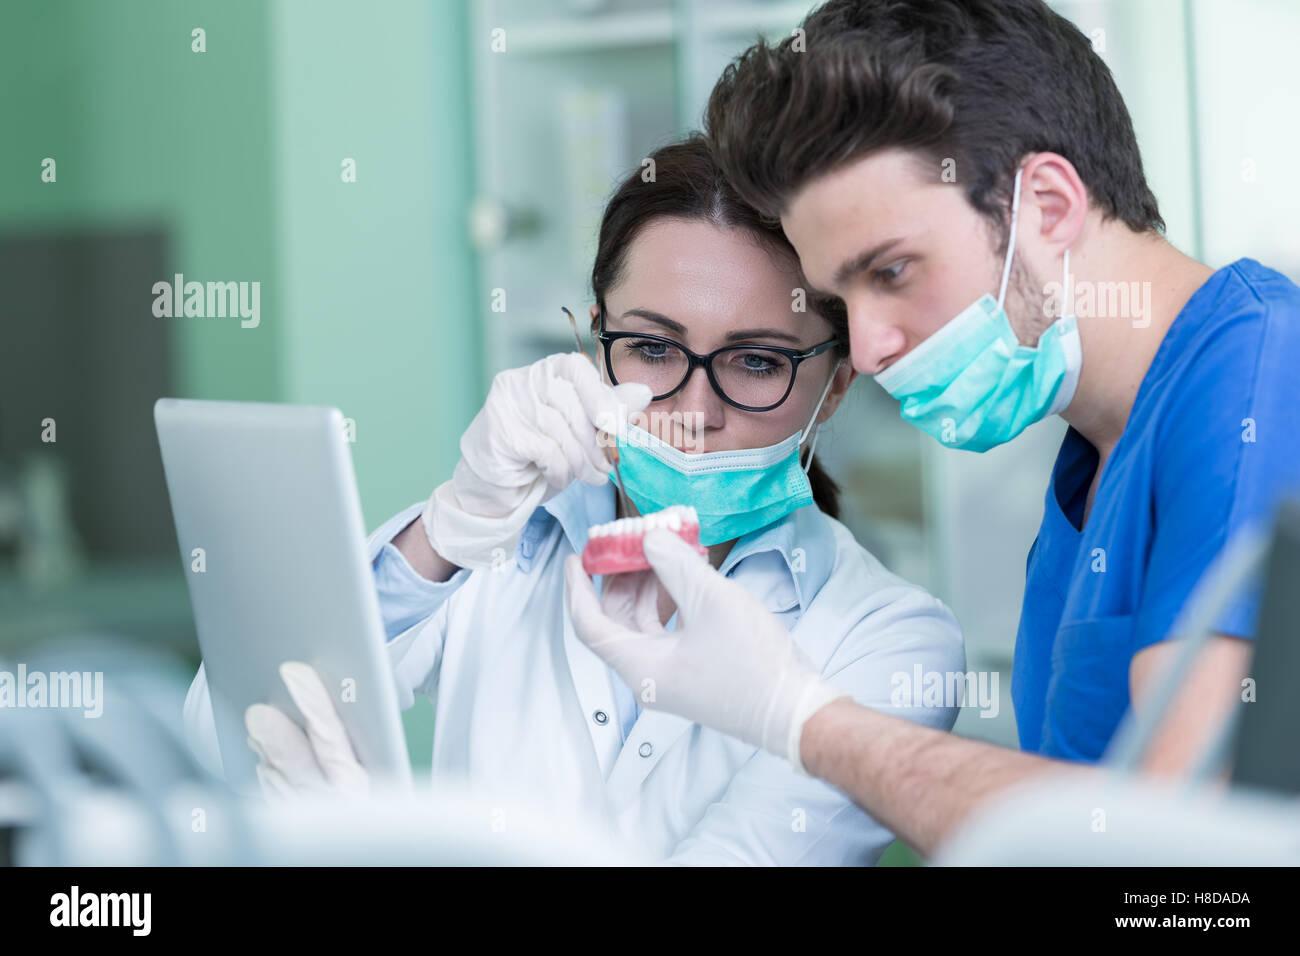 Students with dental prosthesis, dentures, prosthetics work. - Stock Image